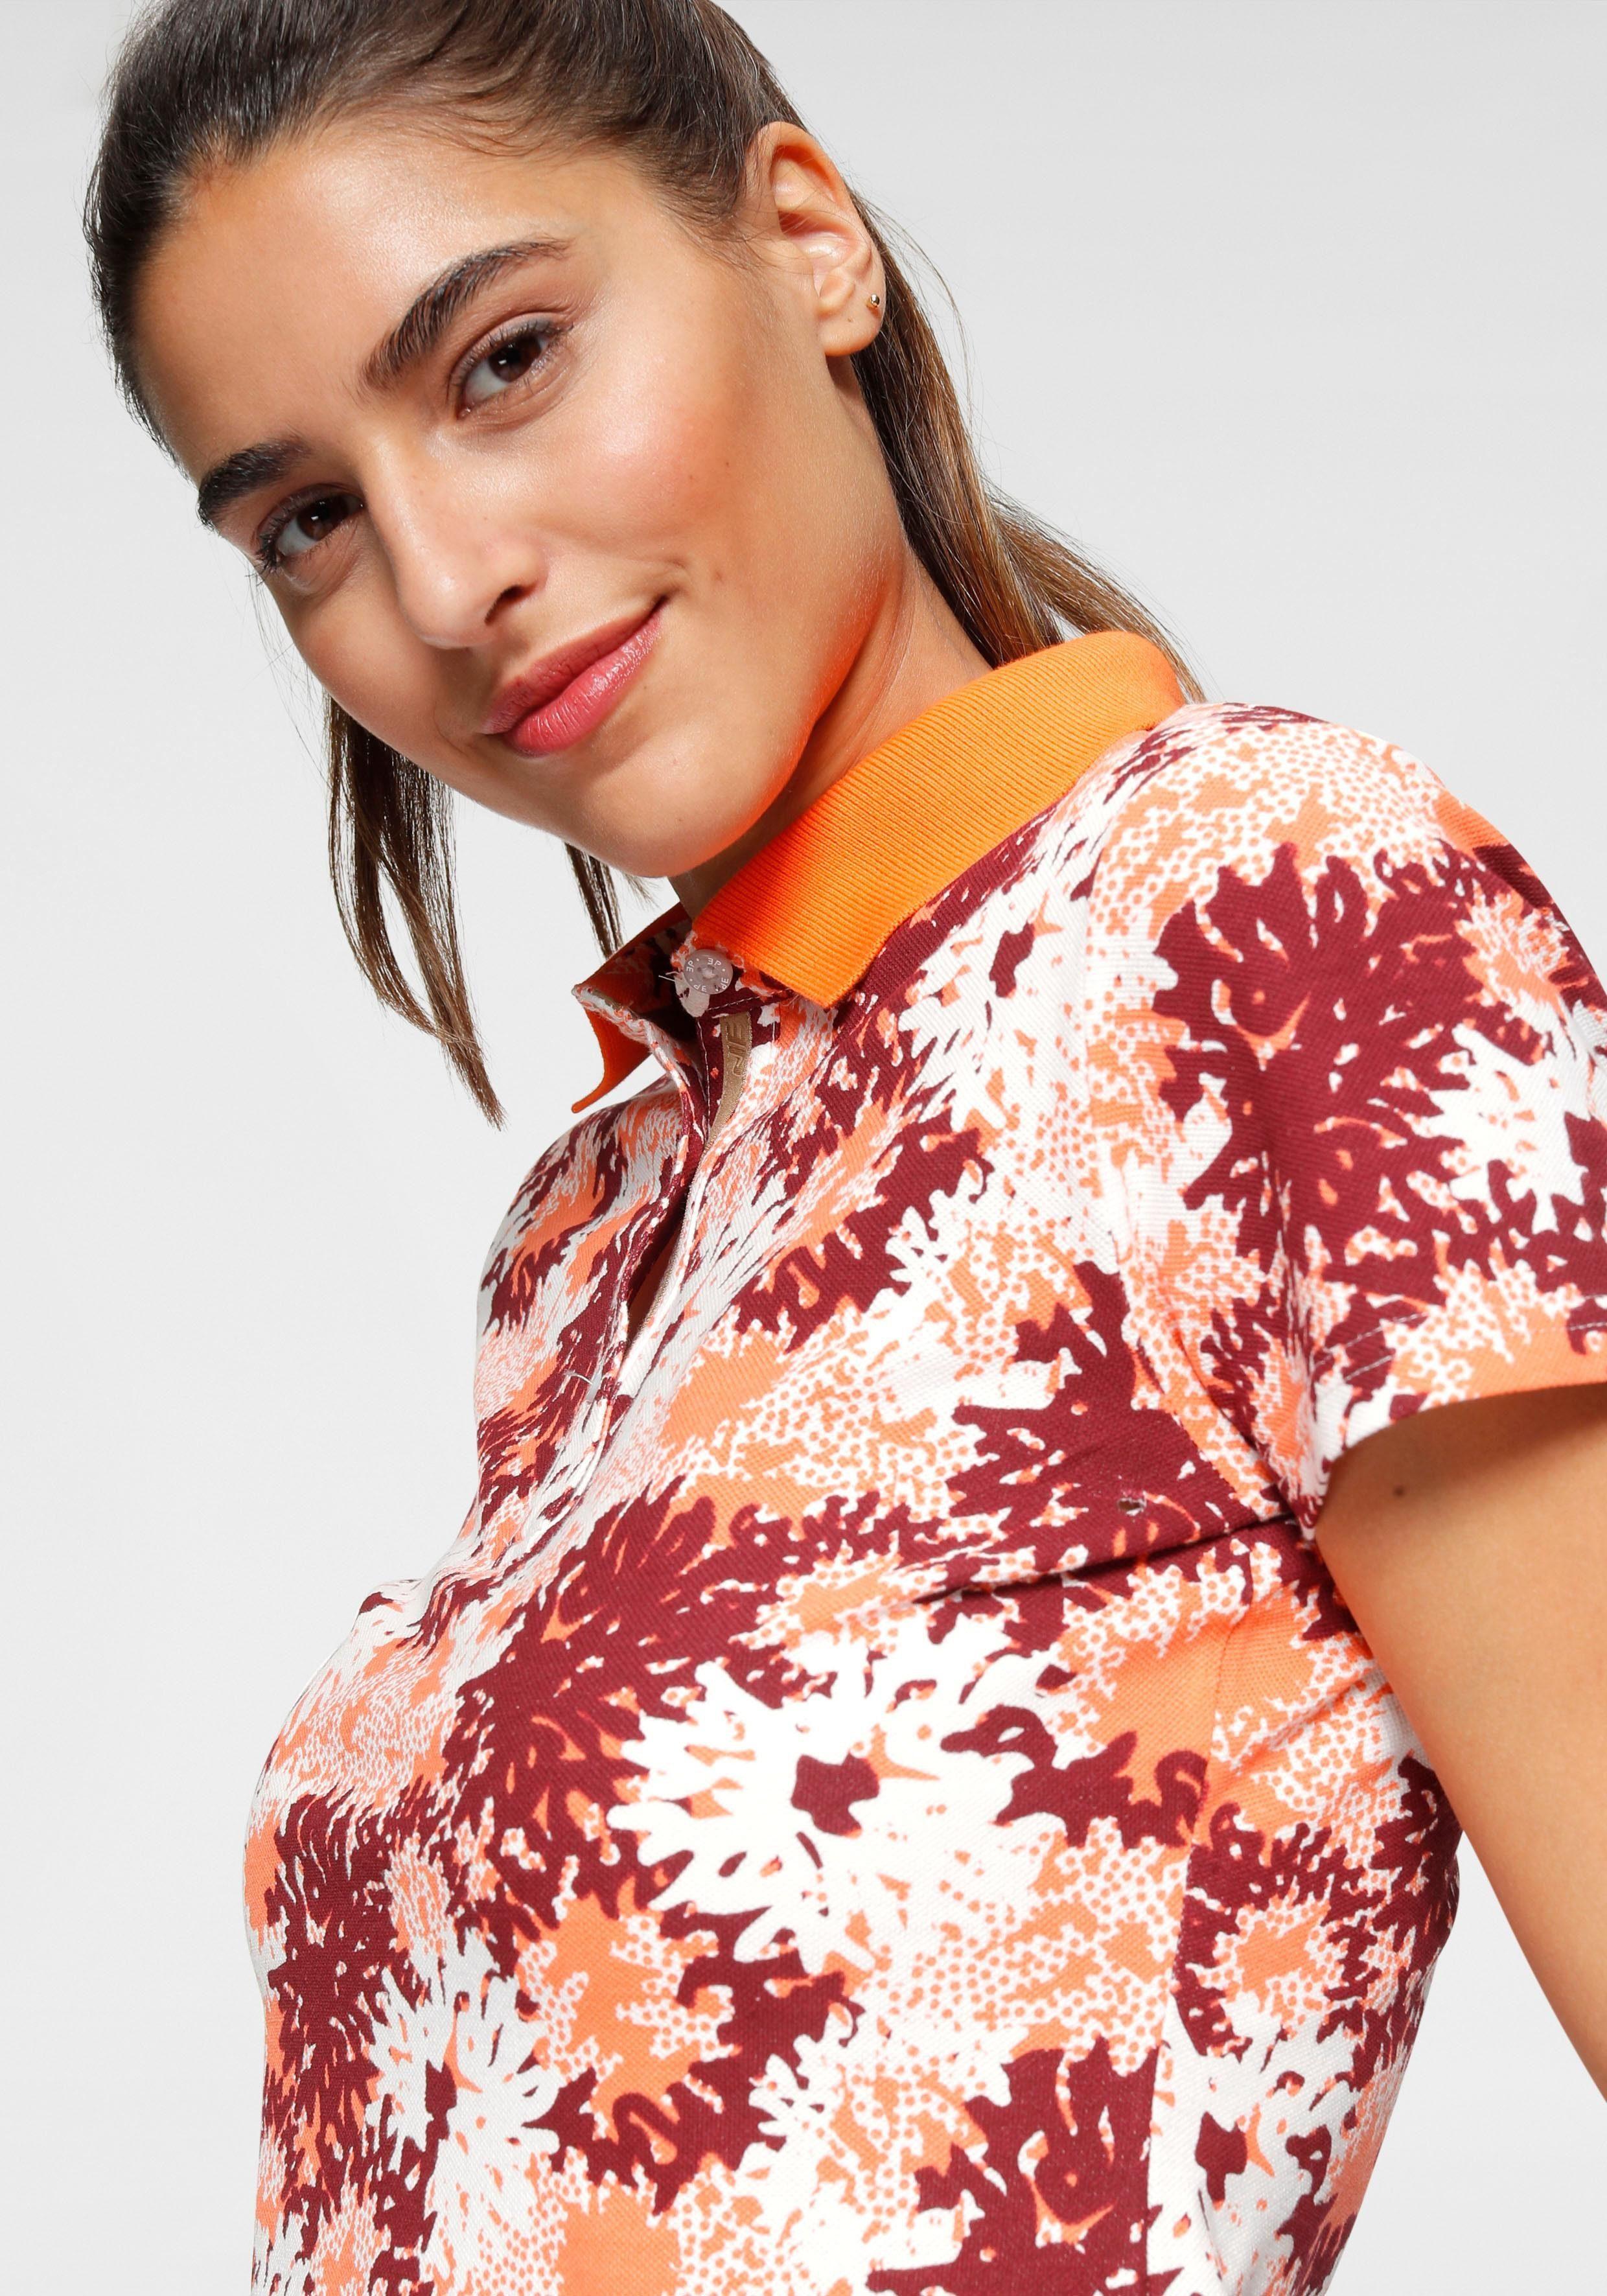 Icepeak Poloshirt AMBERG, Poloshirt von Icepeak online kaufen vrFd2S